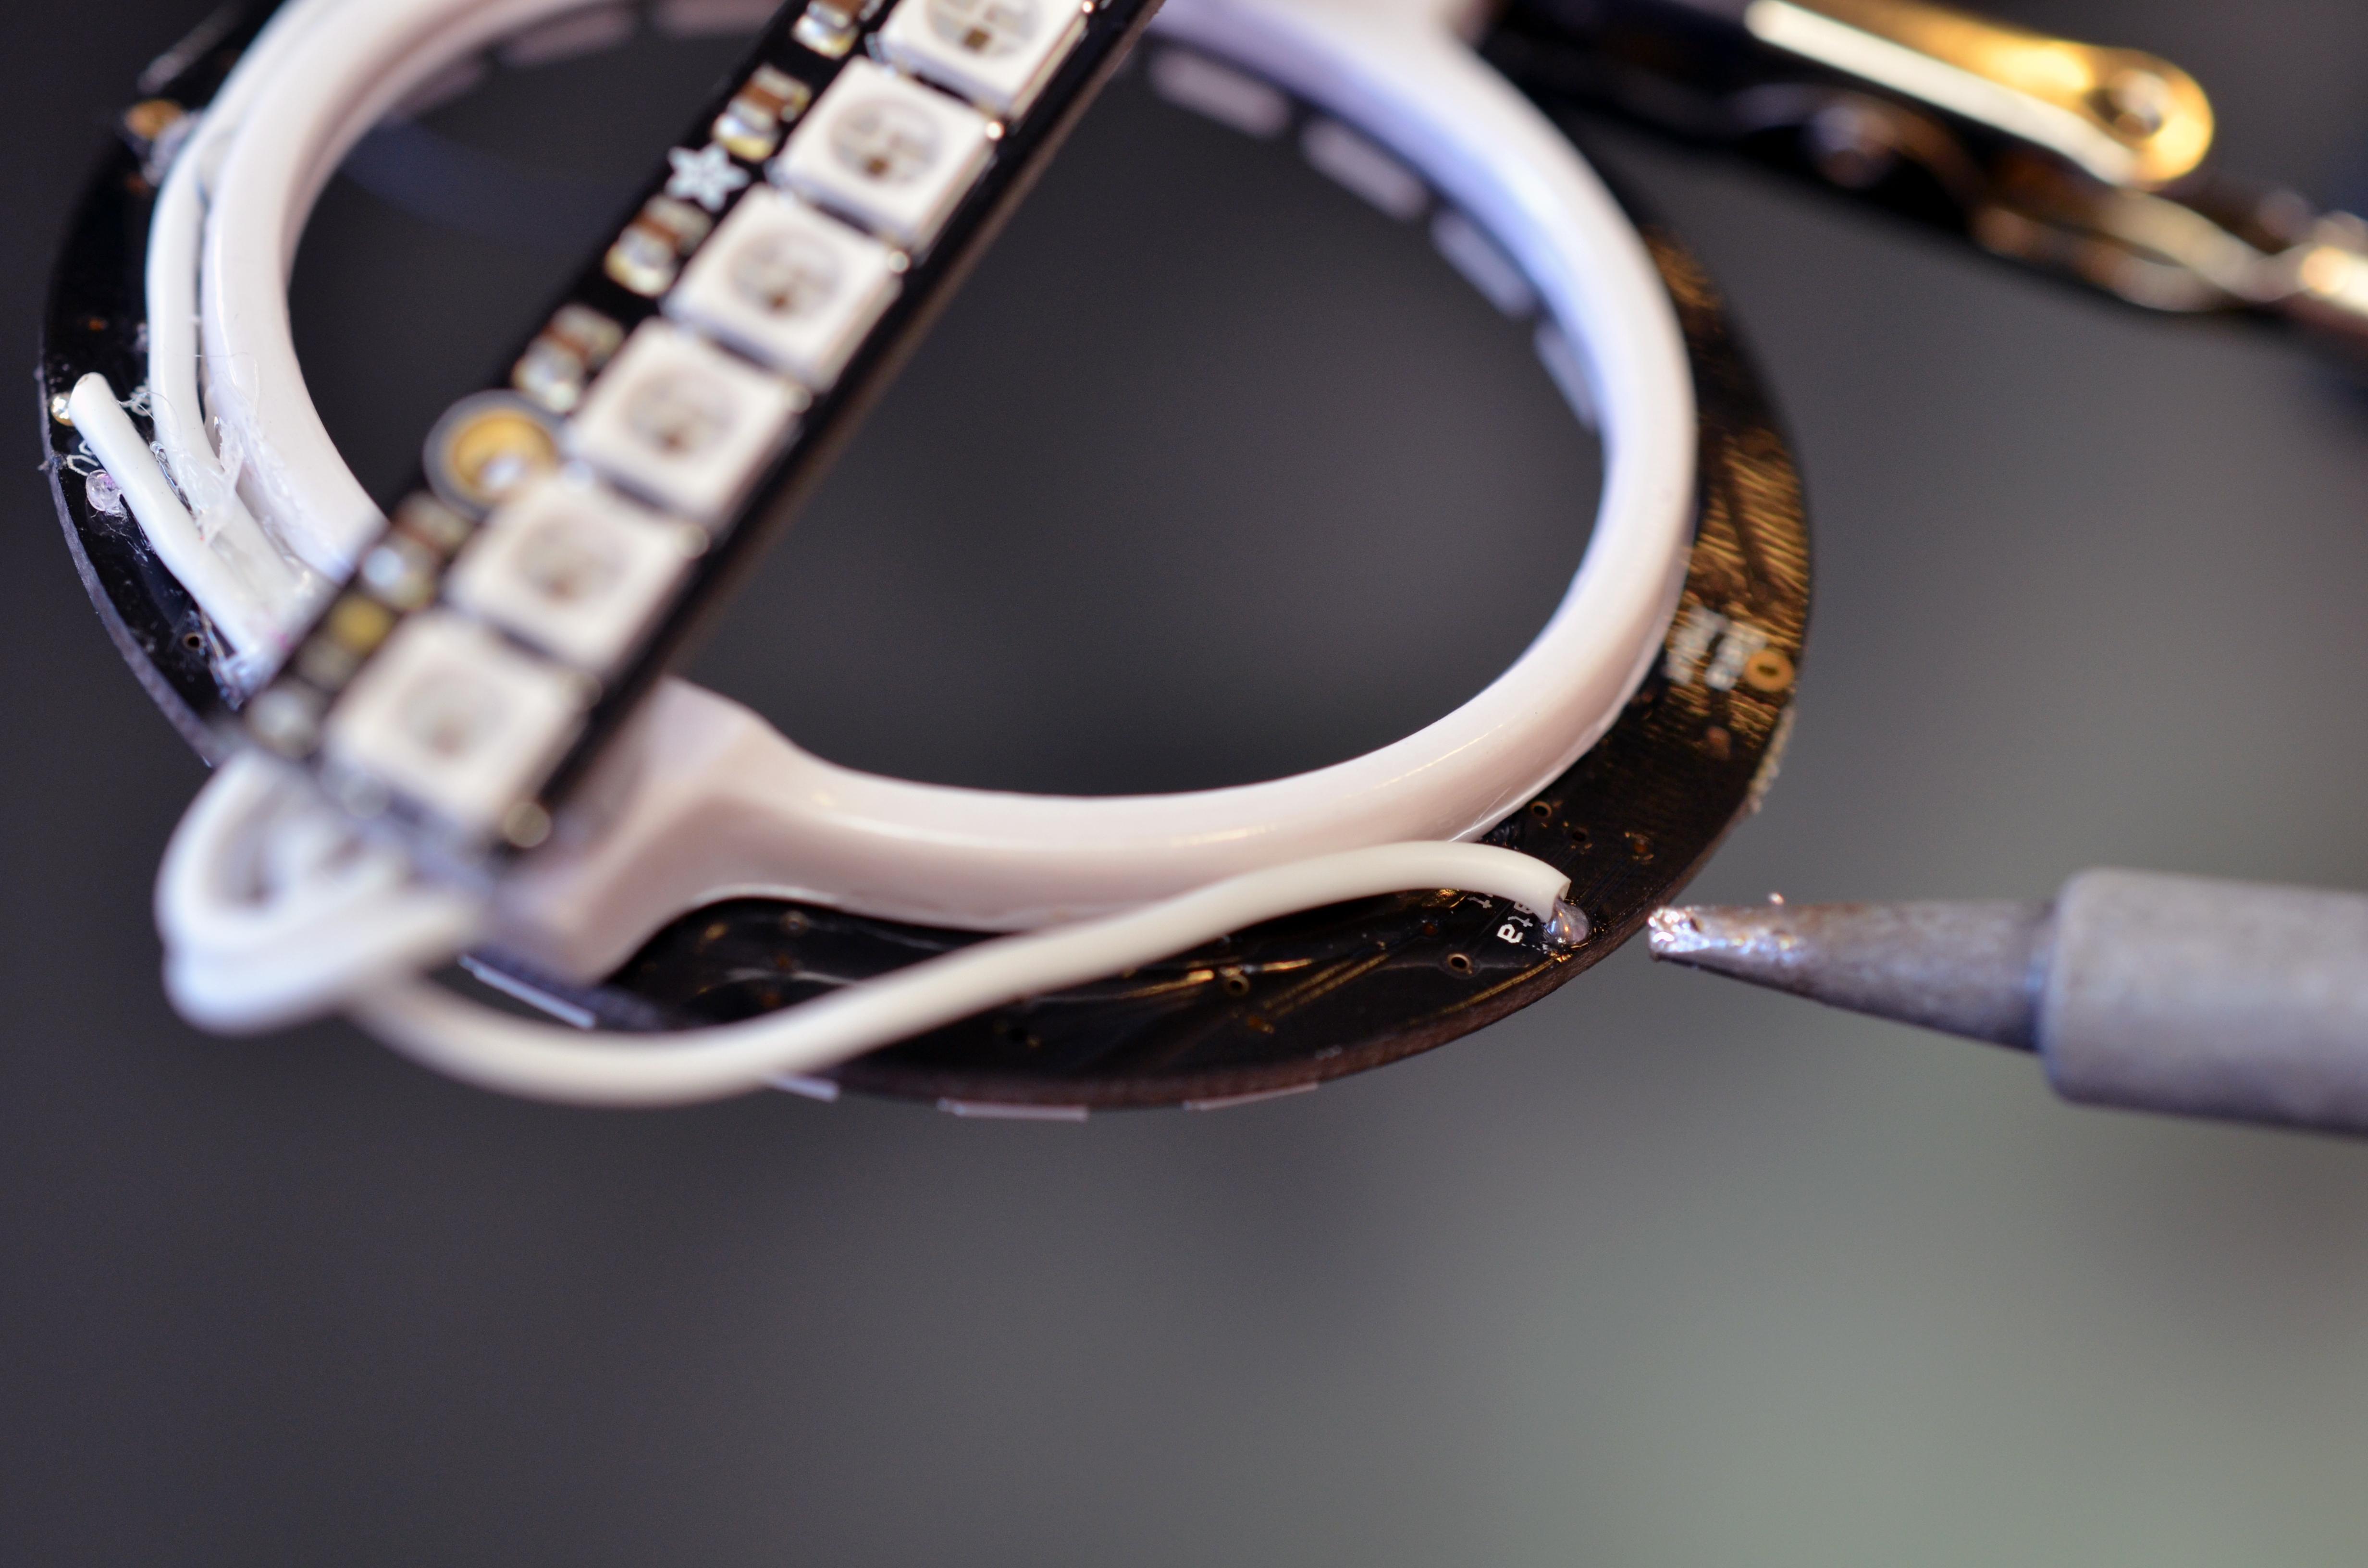 trinket_neopixel-nye-glasses-02.jpg